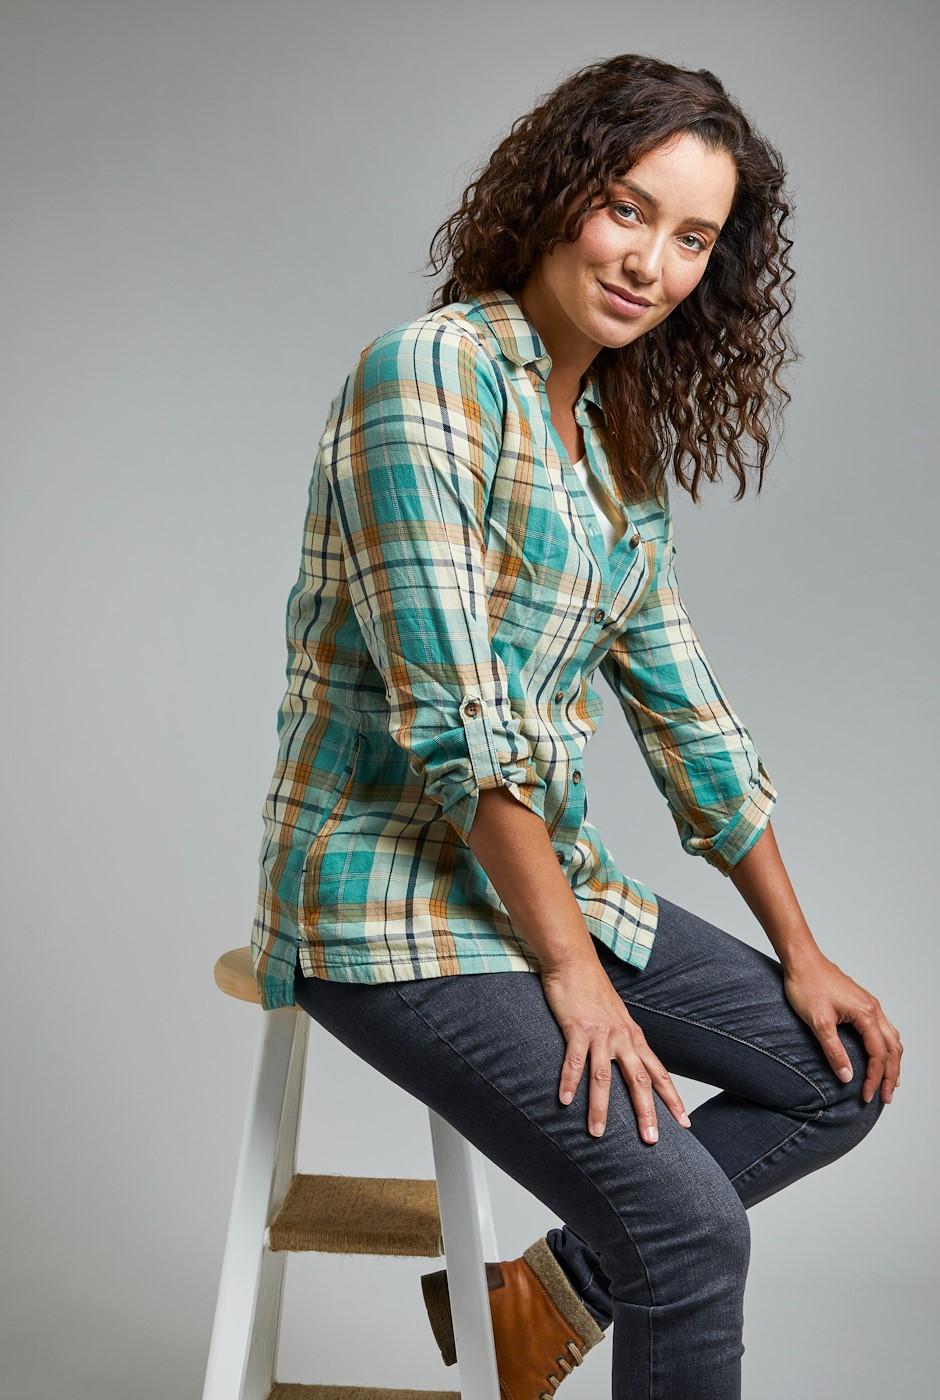 Ashill Organic Cotton Brushed Check Shirt Washed Teal